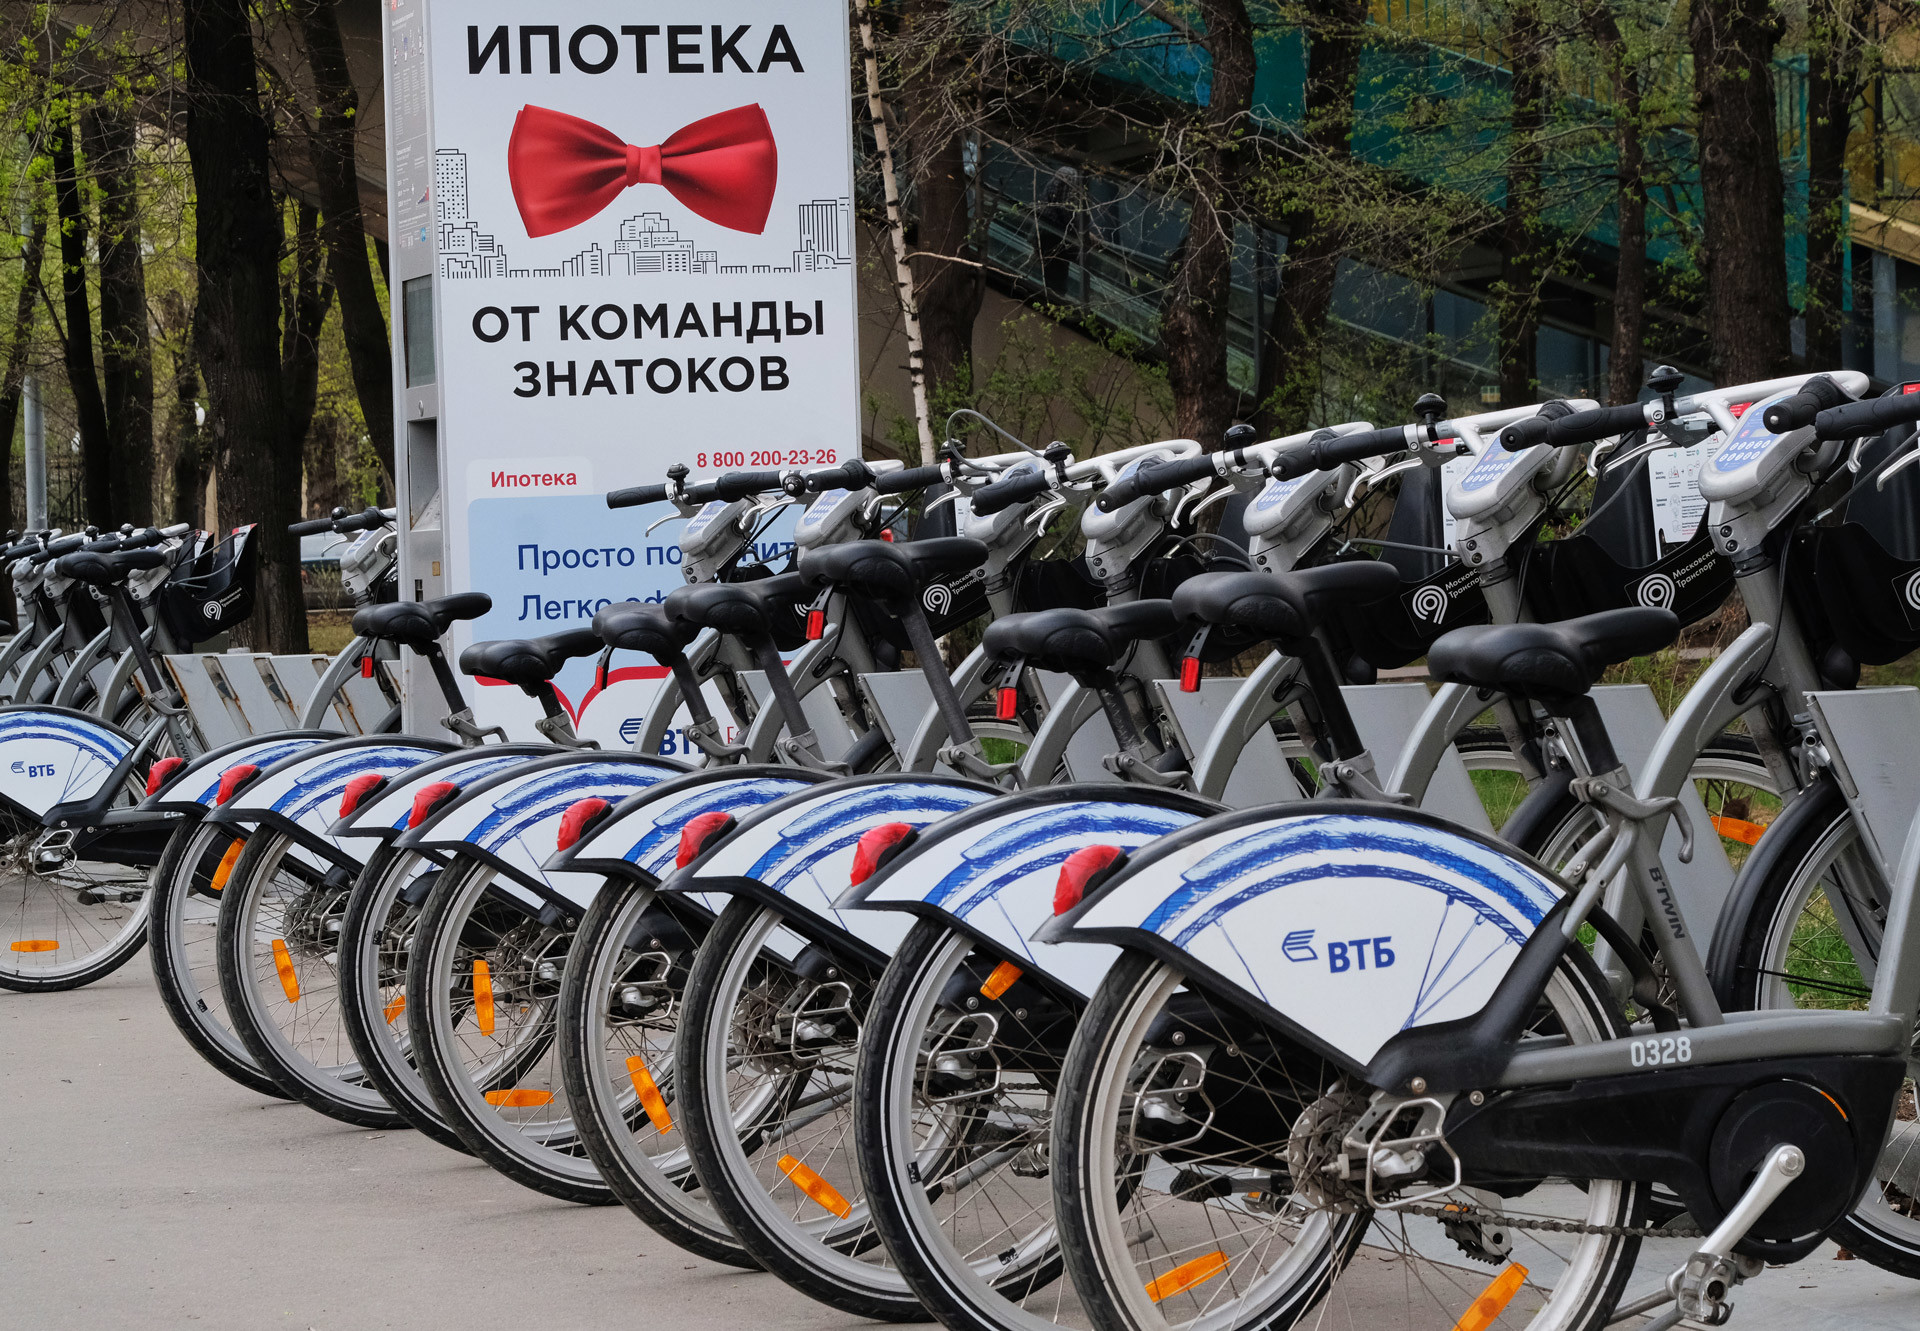 Фото: © РИА Новости / Наталья Селивёрстова